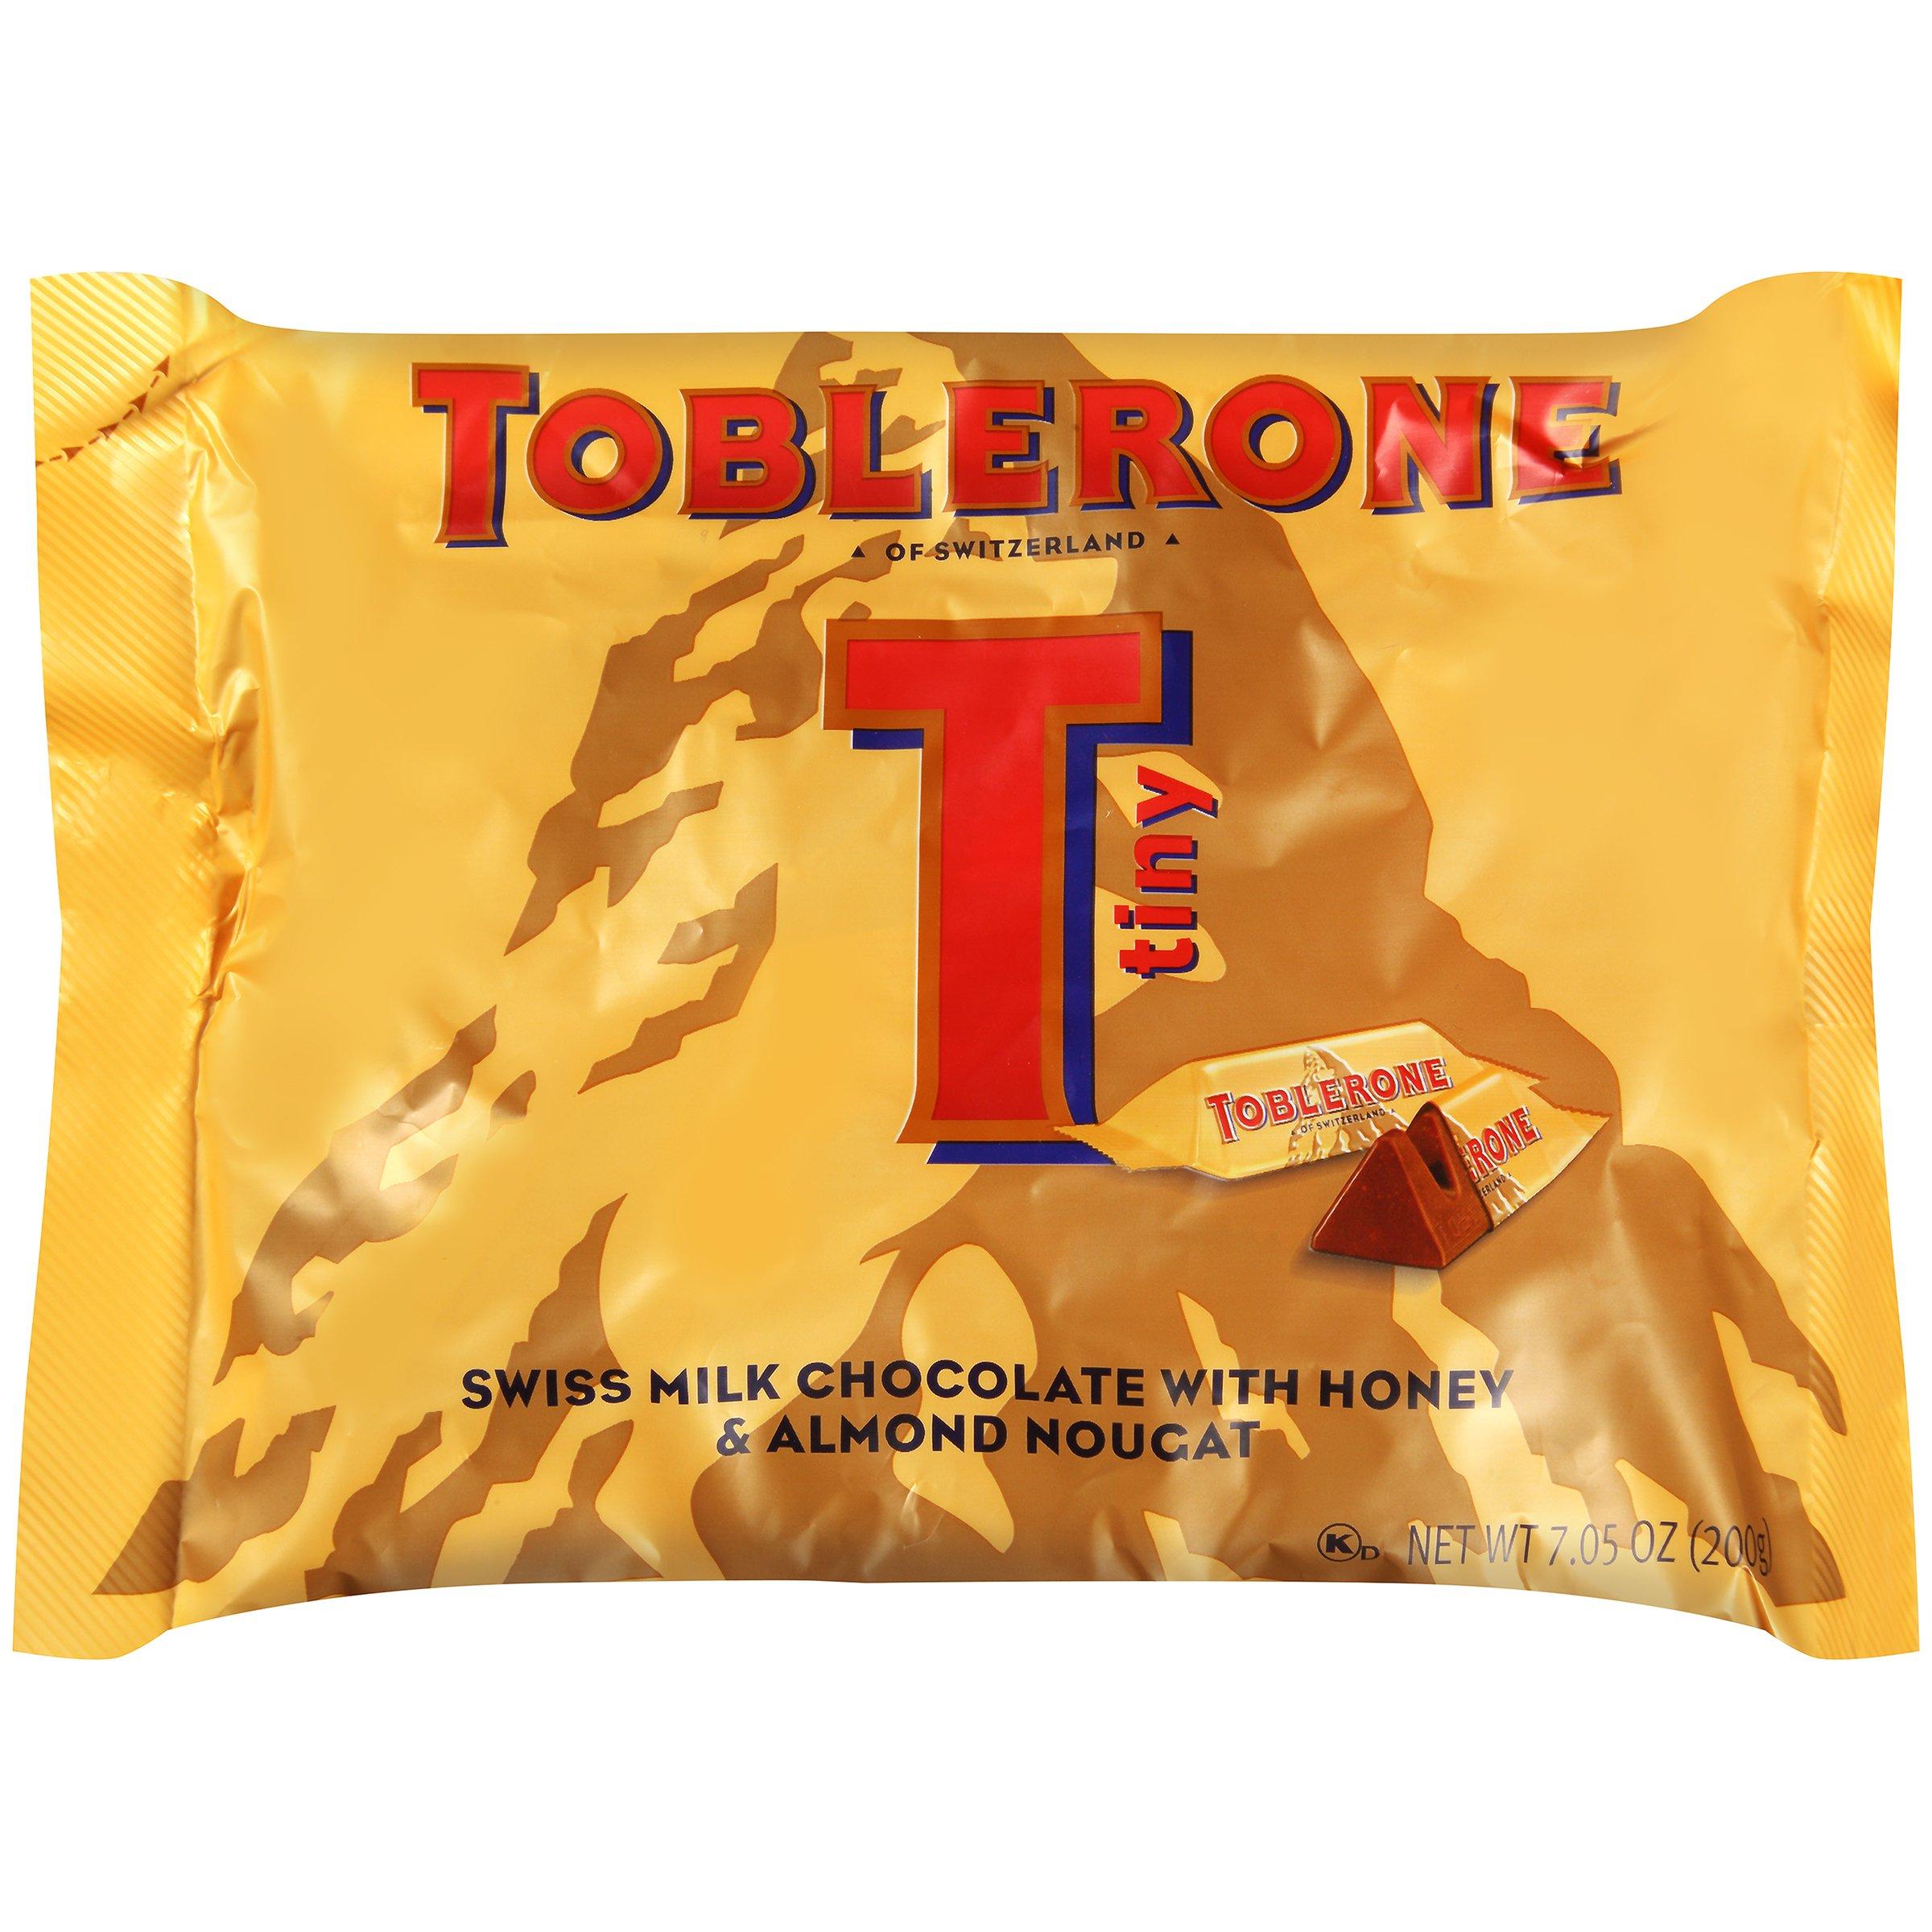 Toblerone Tiny Swiss Milk Chocolate Bars 706 Oz